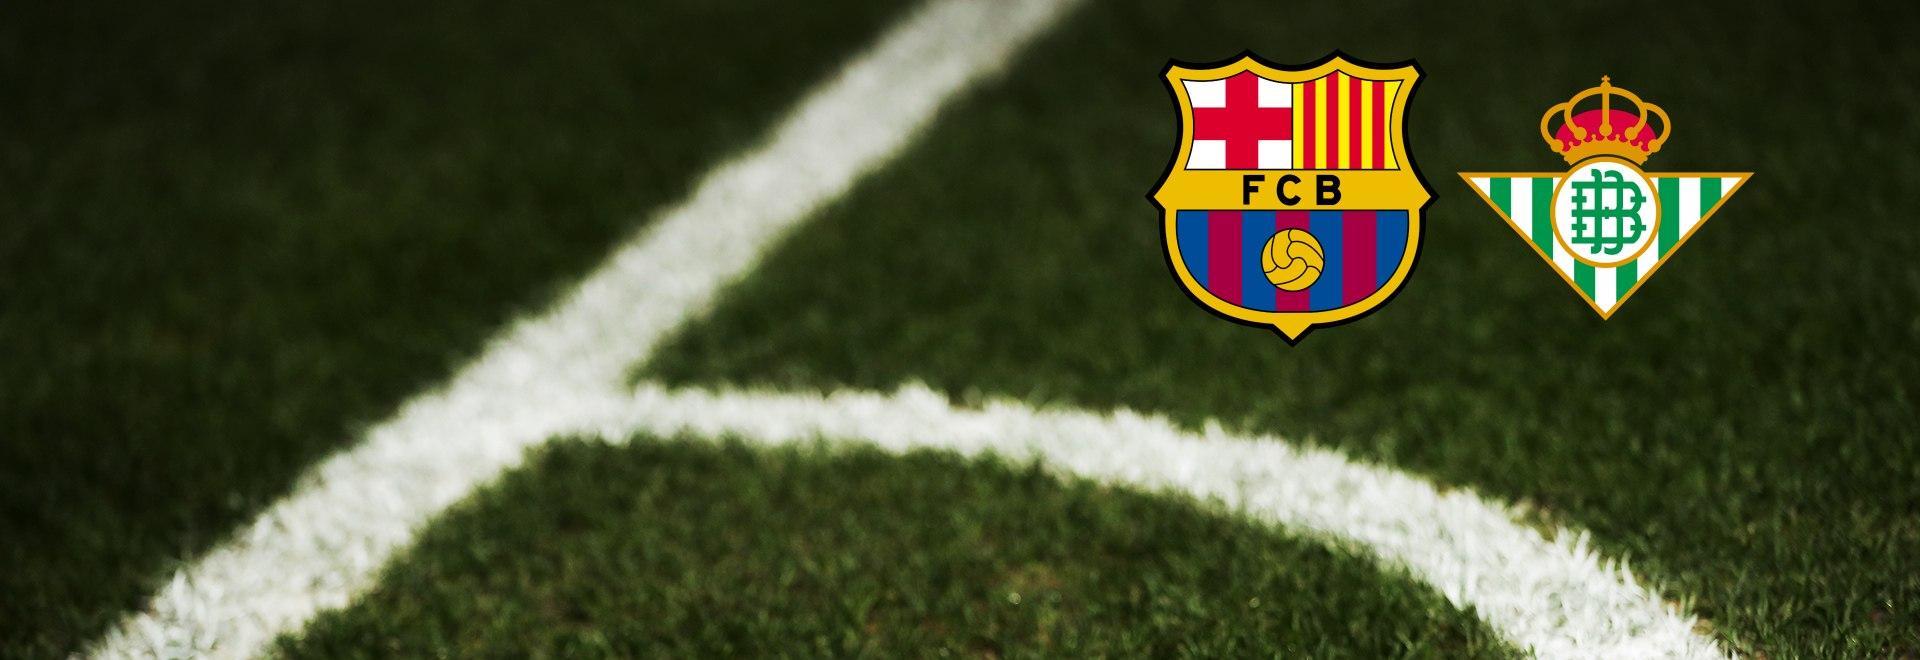 Barcellona - Real Betis. 9a g.